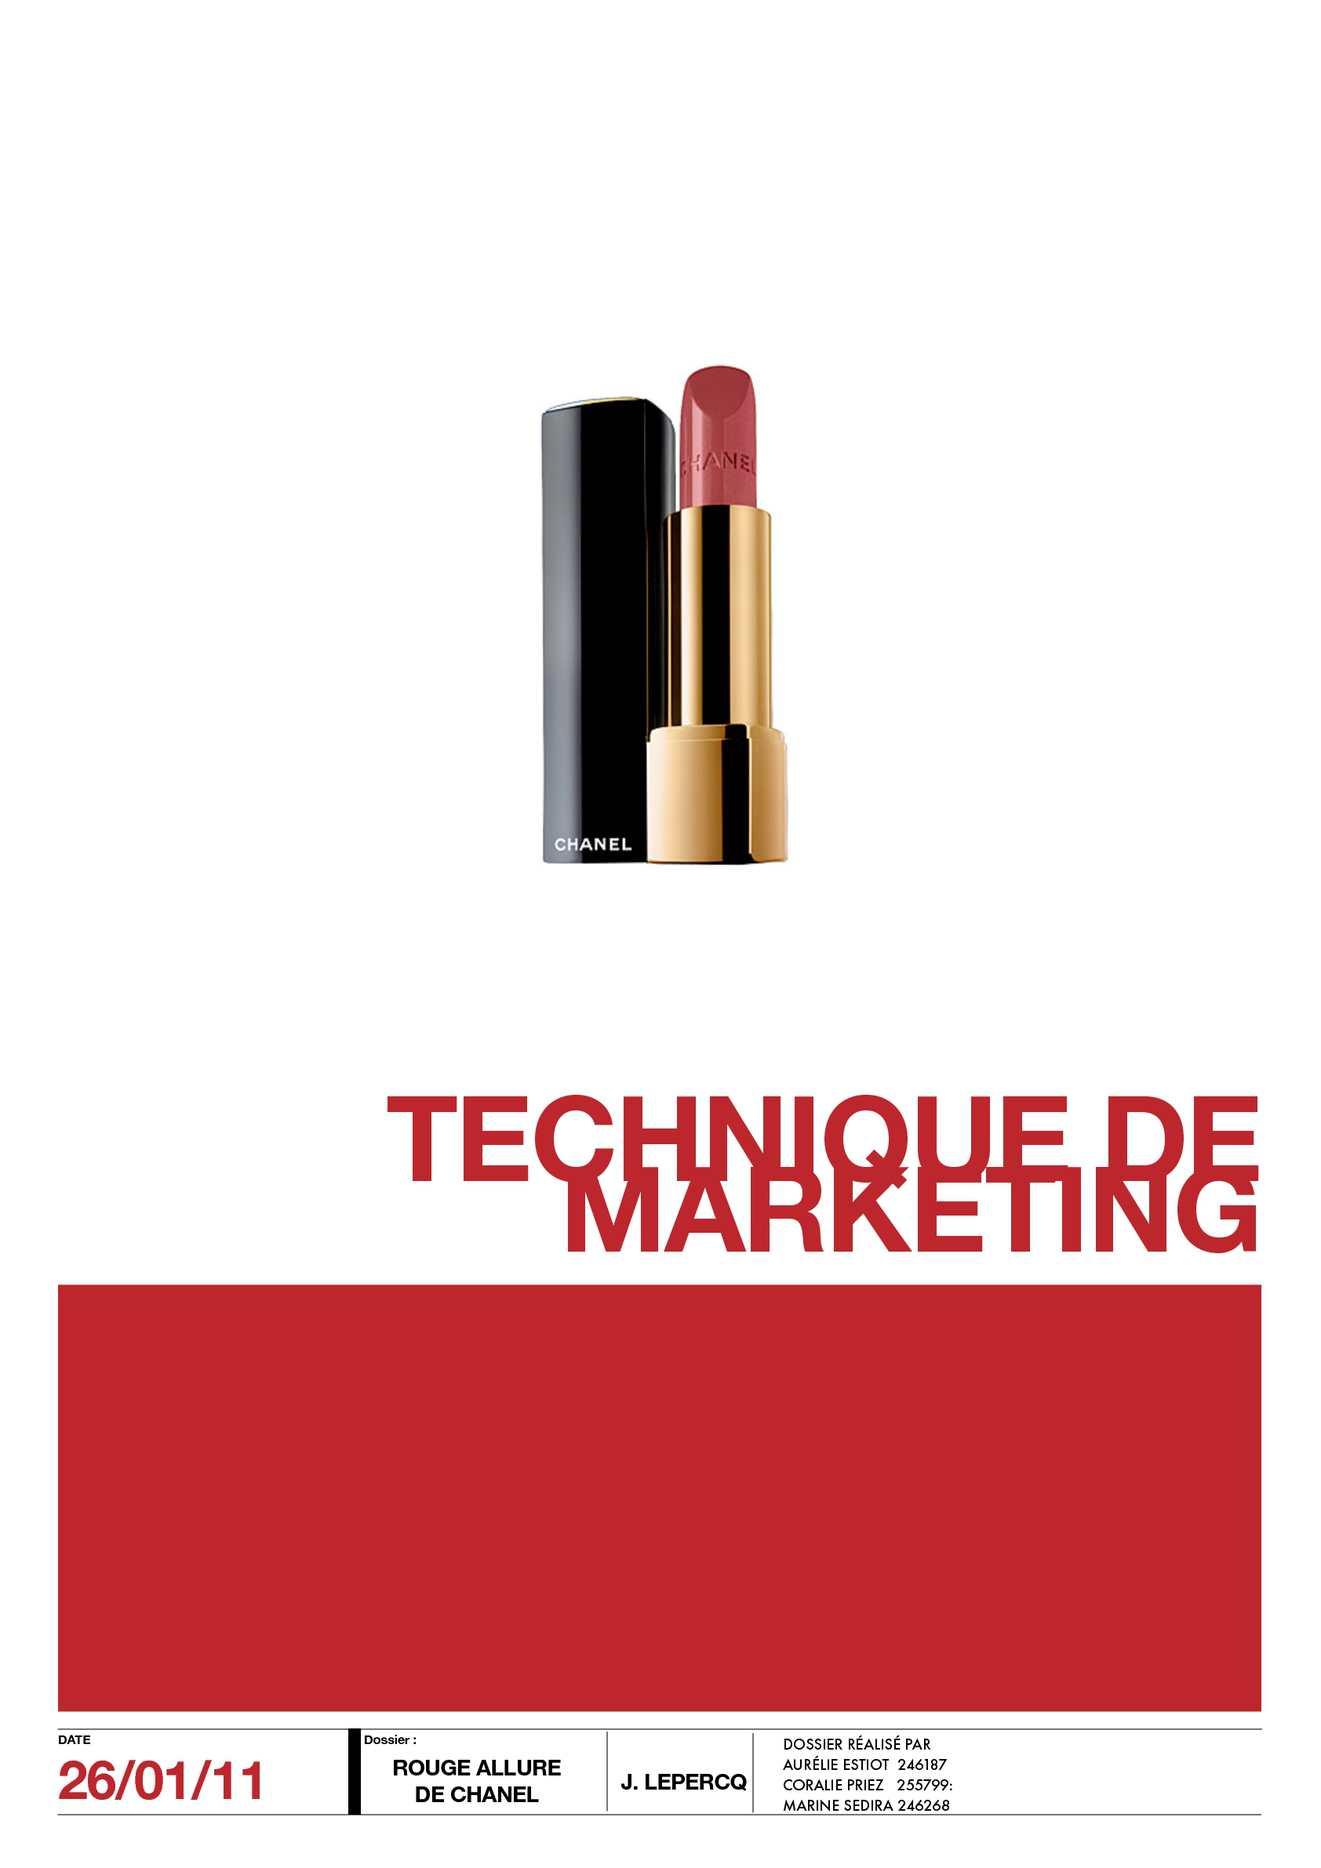 Calaméo - Dossier Allure de Chanel - Technique de Marketing ee5ba42b4c8